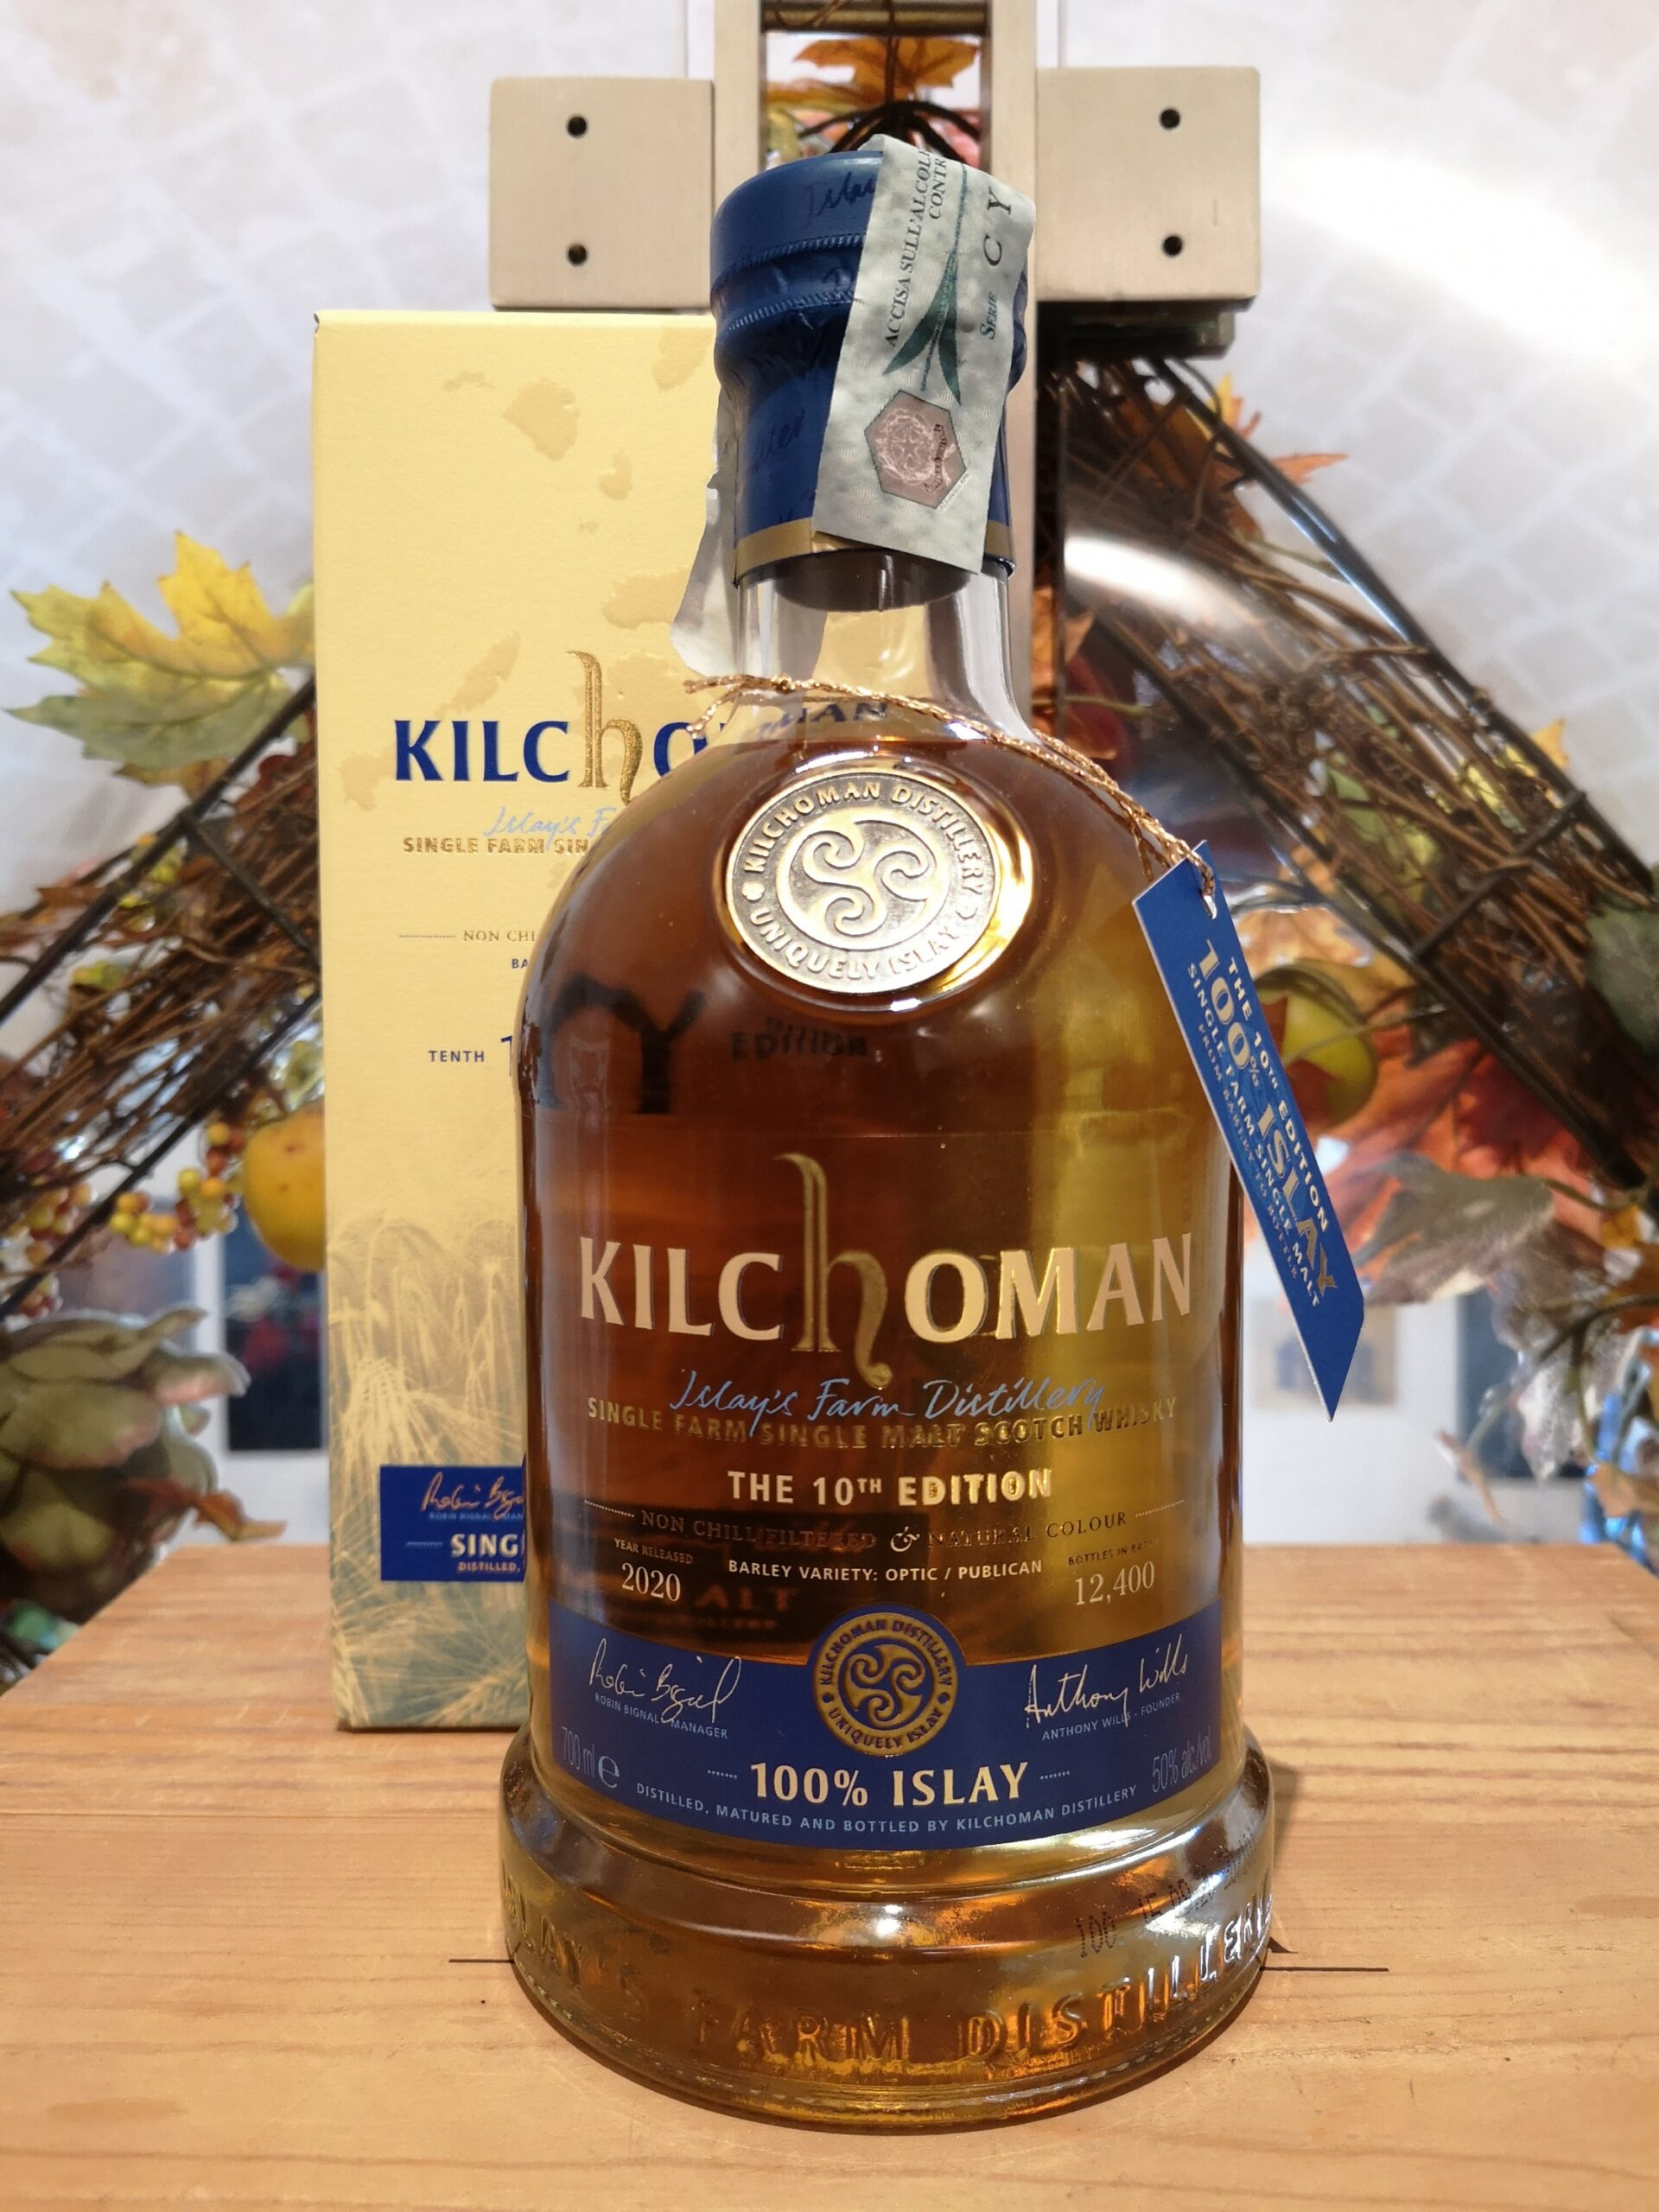 Kilchoman Islay Single Malt Scotch Whisky 100% Islay 2020 10th Edition